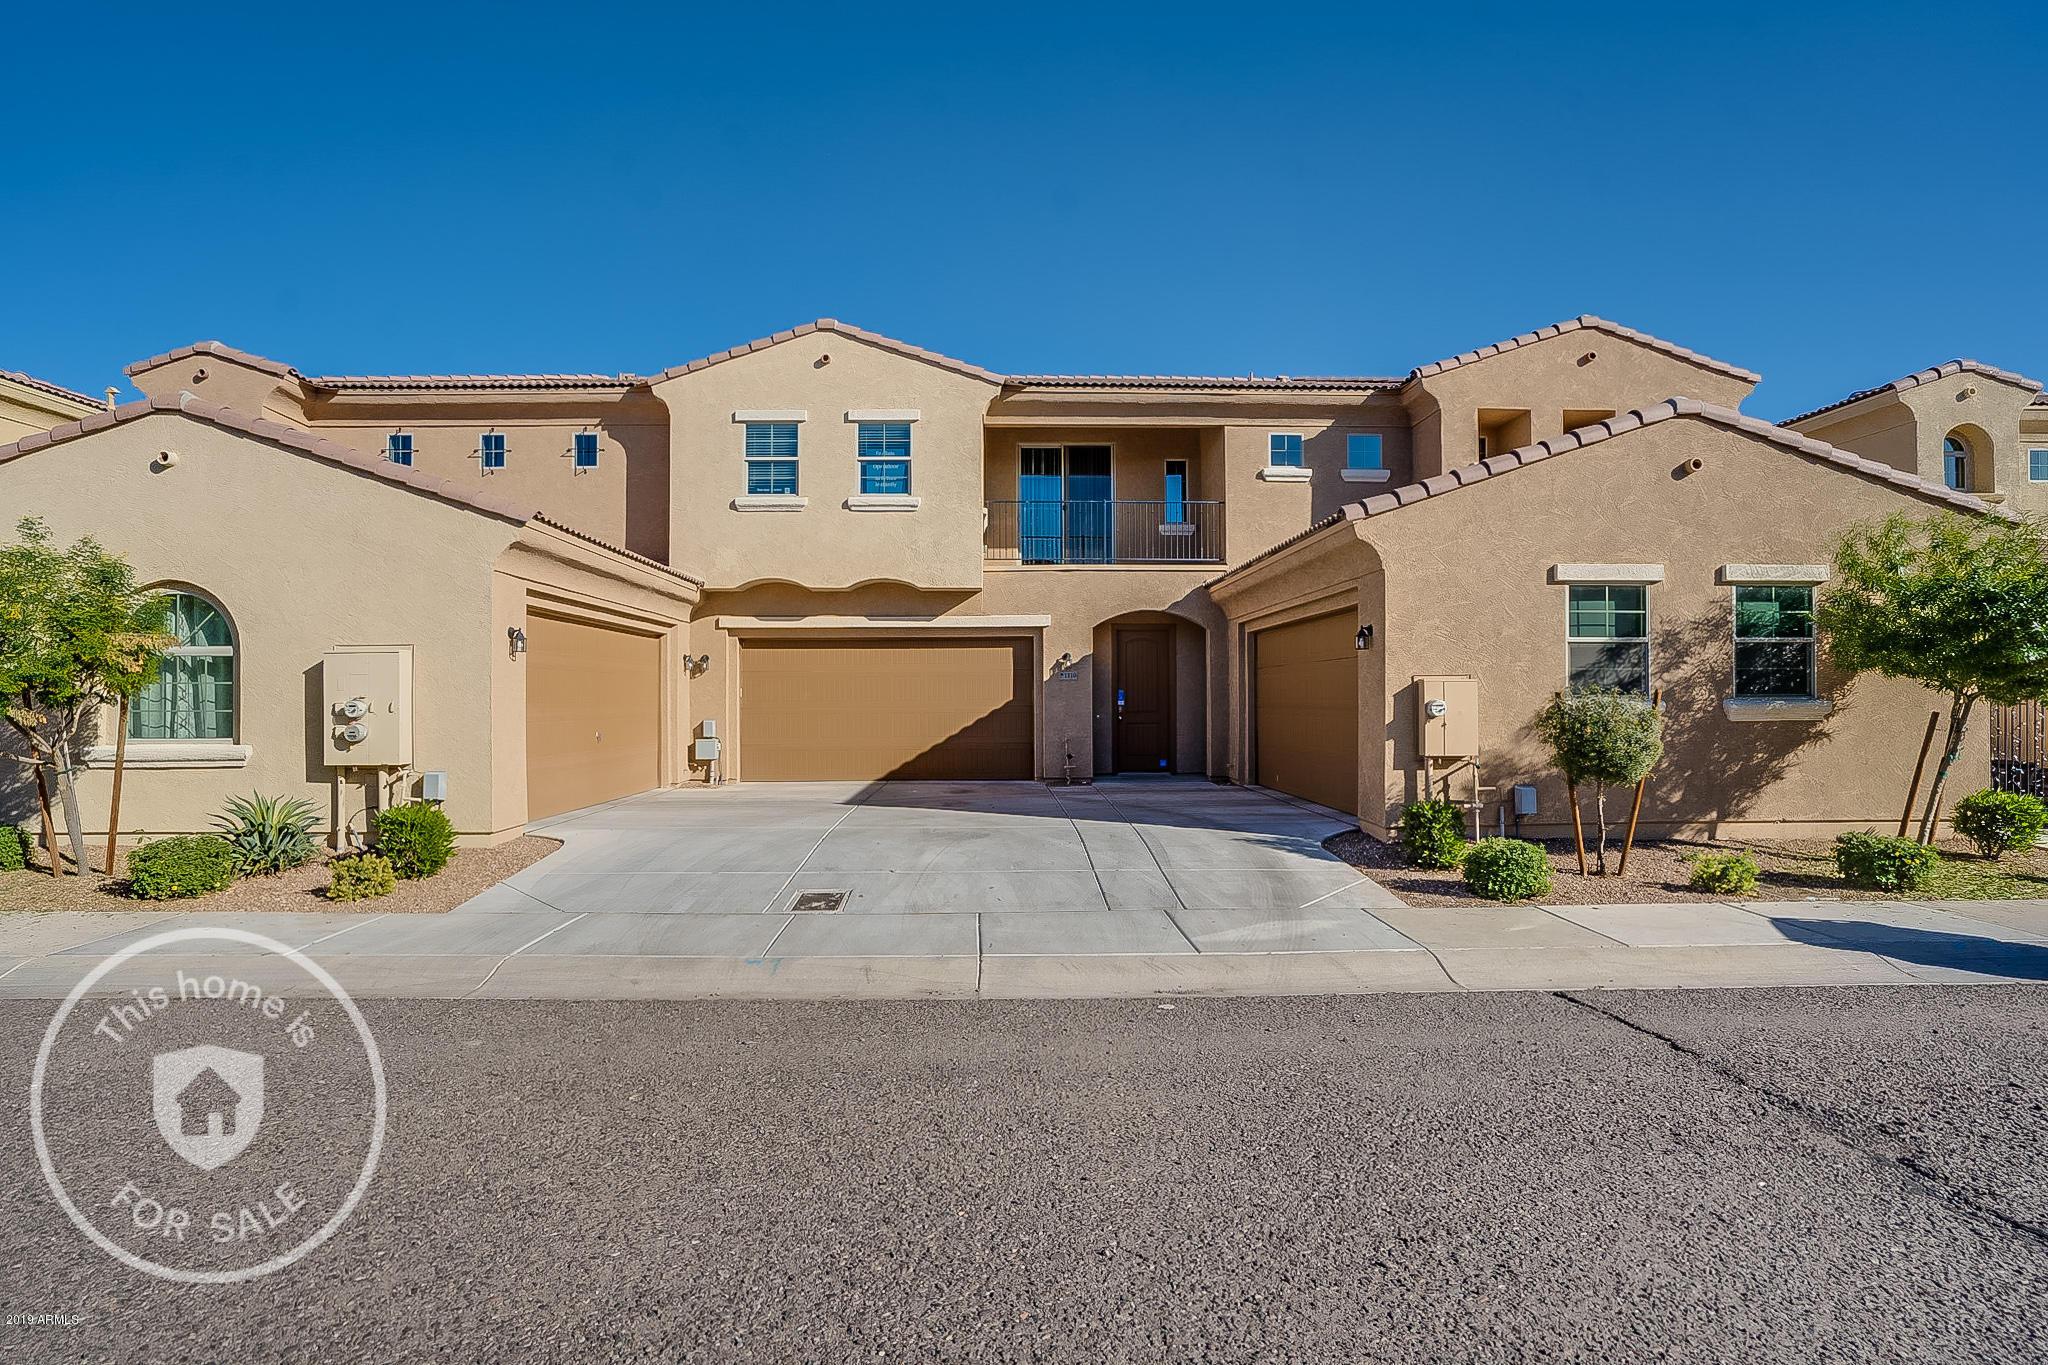 Photo of 1367 S COUNTRY CLUB Drive #1110, Mesa, AZ 85210